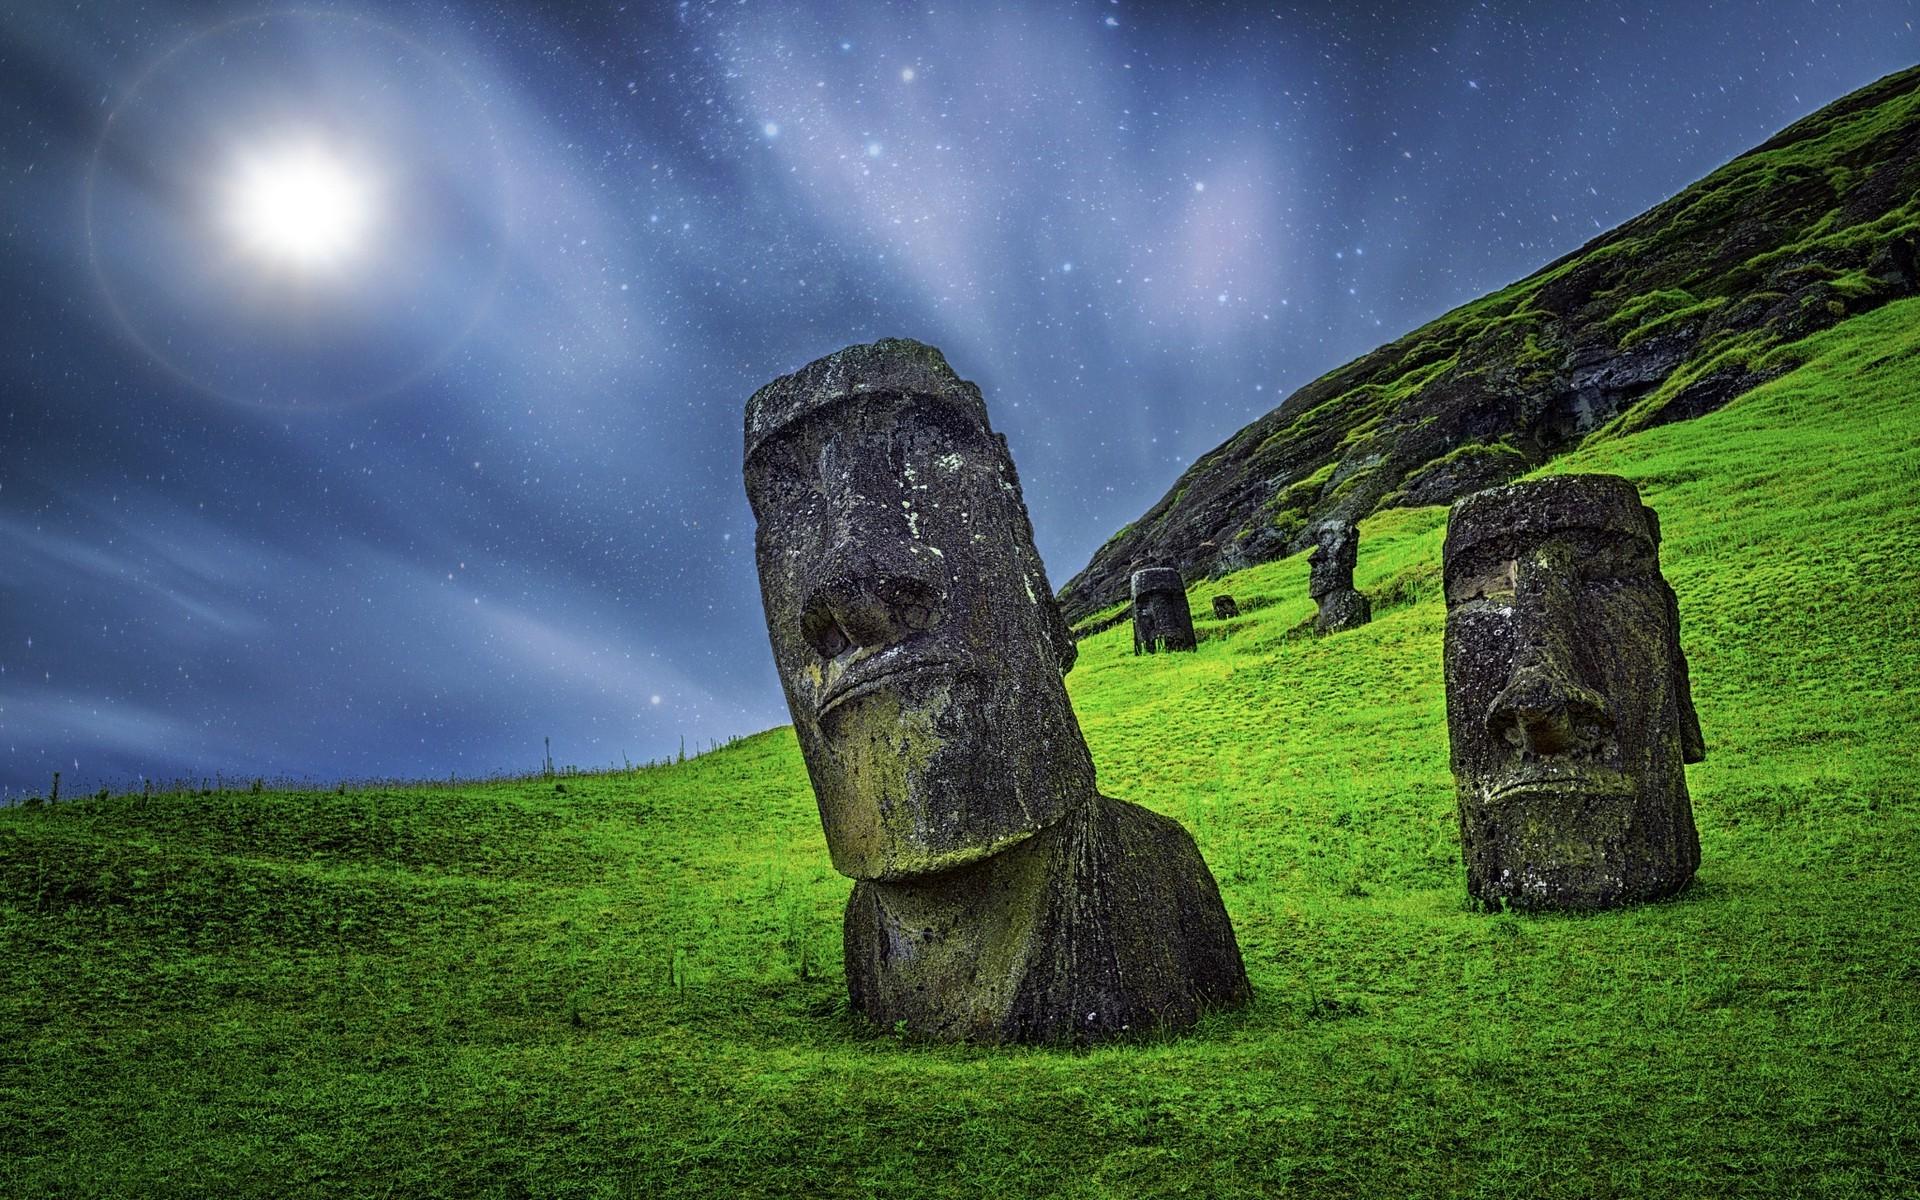 Download Wallpaper Night Grass - sunlight-landscape-rock-nature-grass-sky-long-exposure-sculpture-statue-moonlight-starry-night-stone-Chile-Monolith-Easter-Island-Rapa-Nui-Moai-enigma-light-darkness-screenshot-1920x1200-px-computer-wallpaper-622854  Gallery-169887.jpg